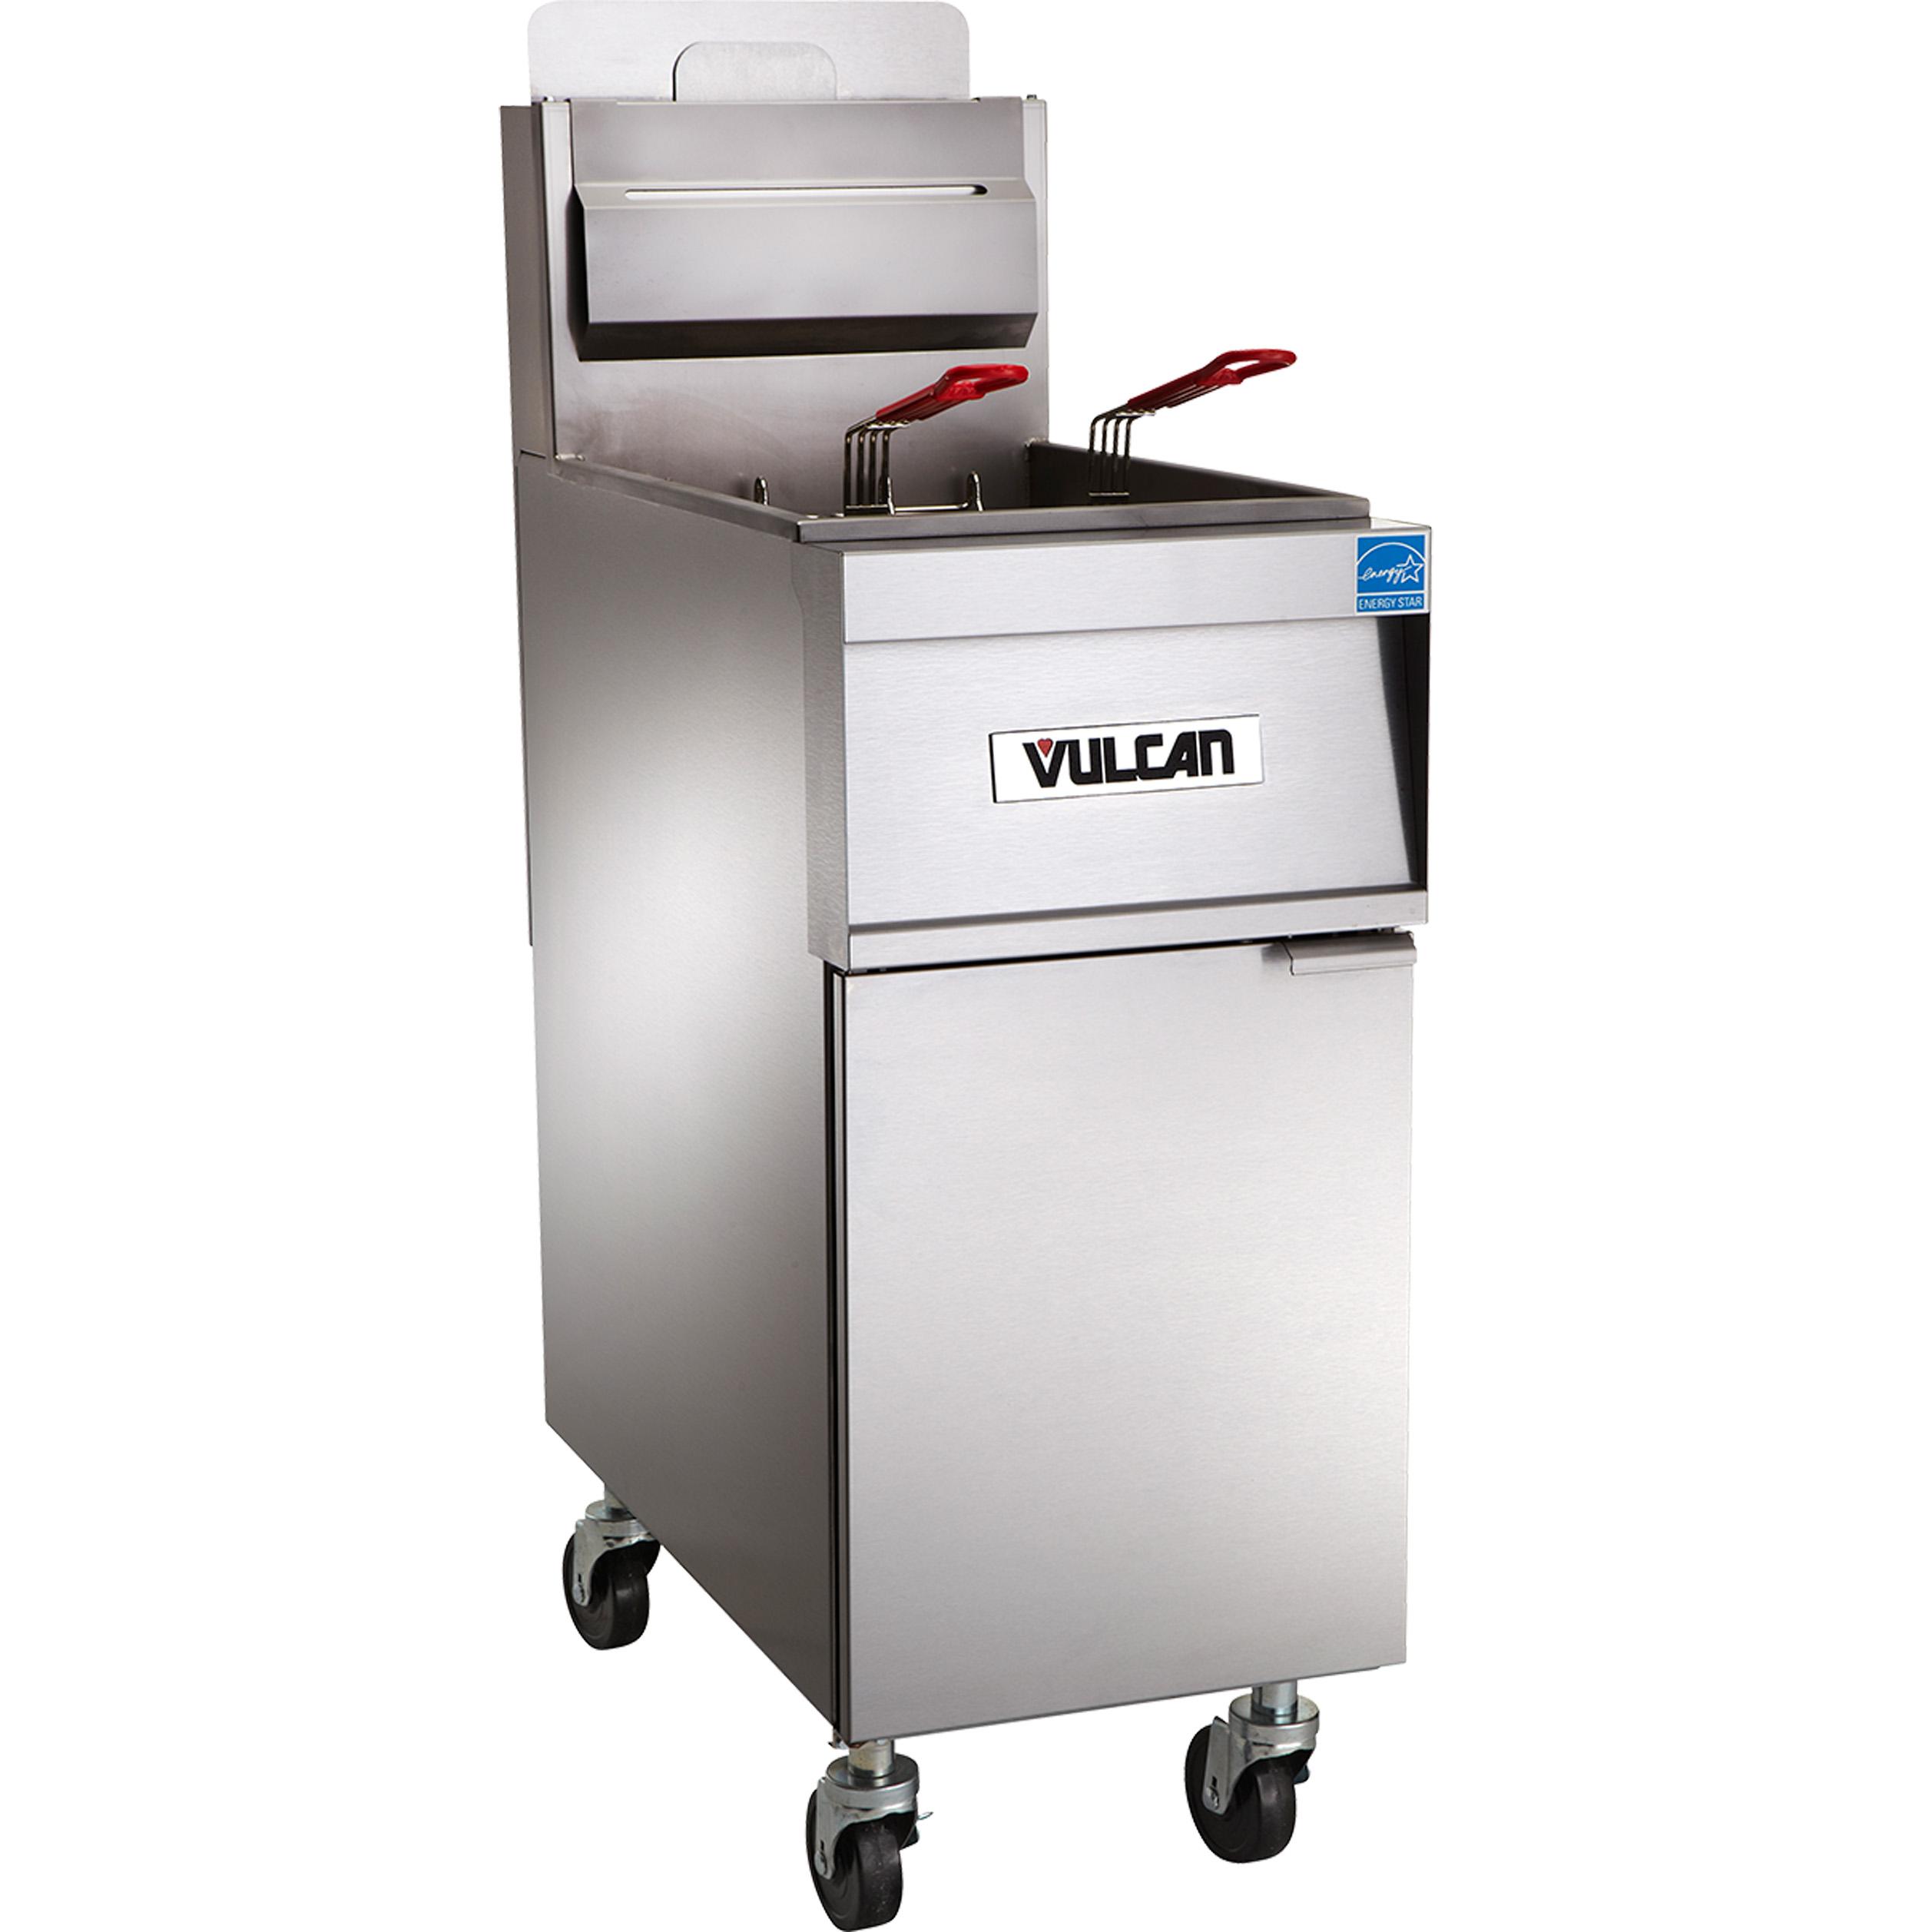 Vulcan 4TR45CF fryer, gas, multiple battery